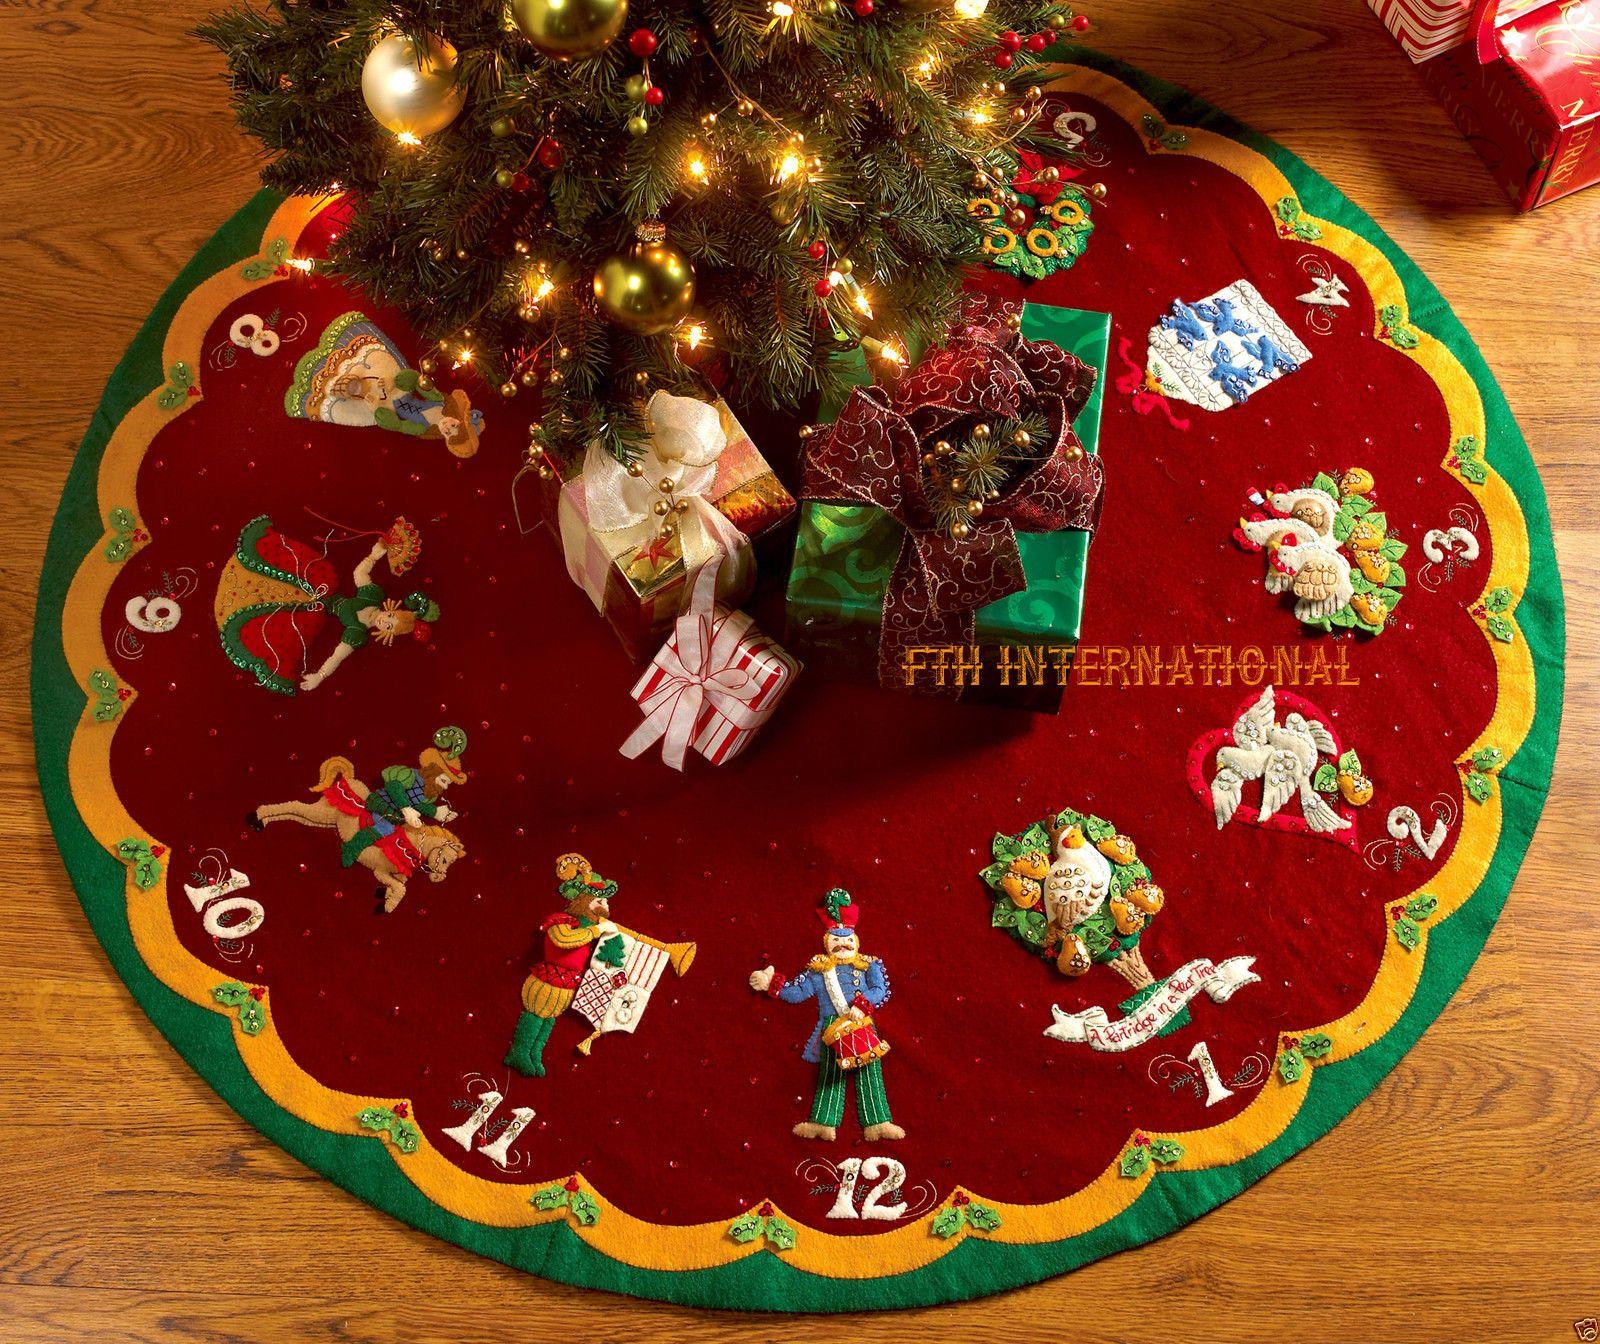 Bucilla 12 Days Of Christmas 43 Felt Tree Skirt Kit 86068 Partridge Pear Tree Felt Tree Skirt Felt Tree Felt Christmas Tree